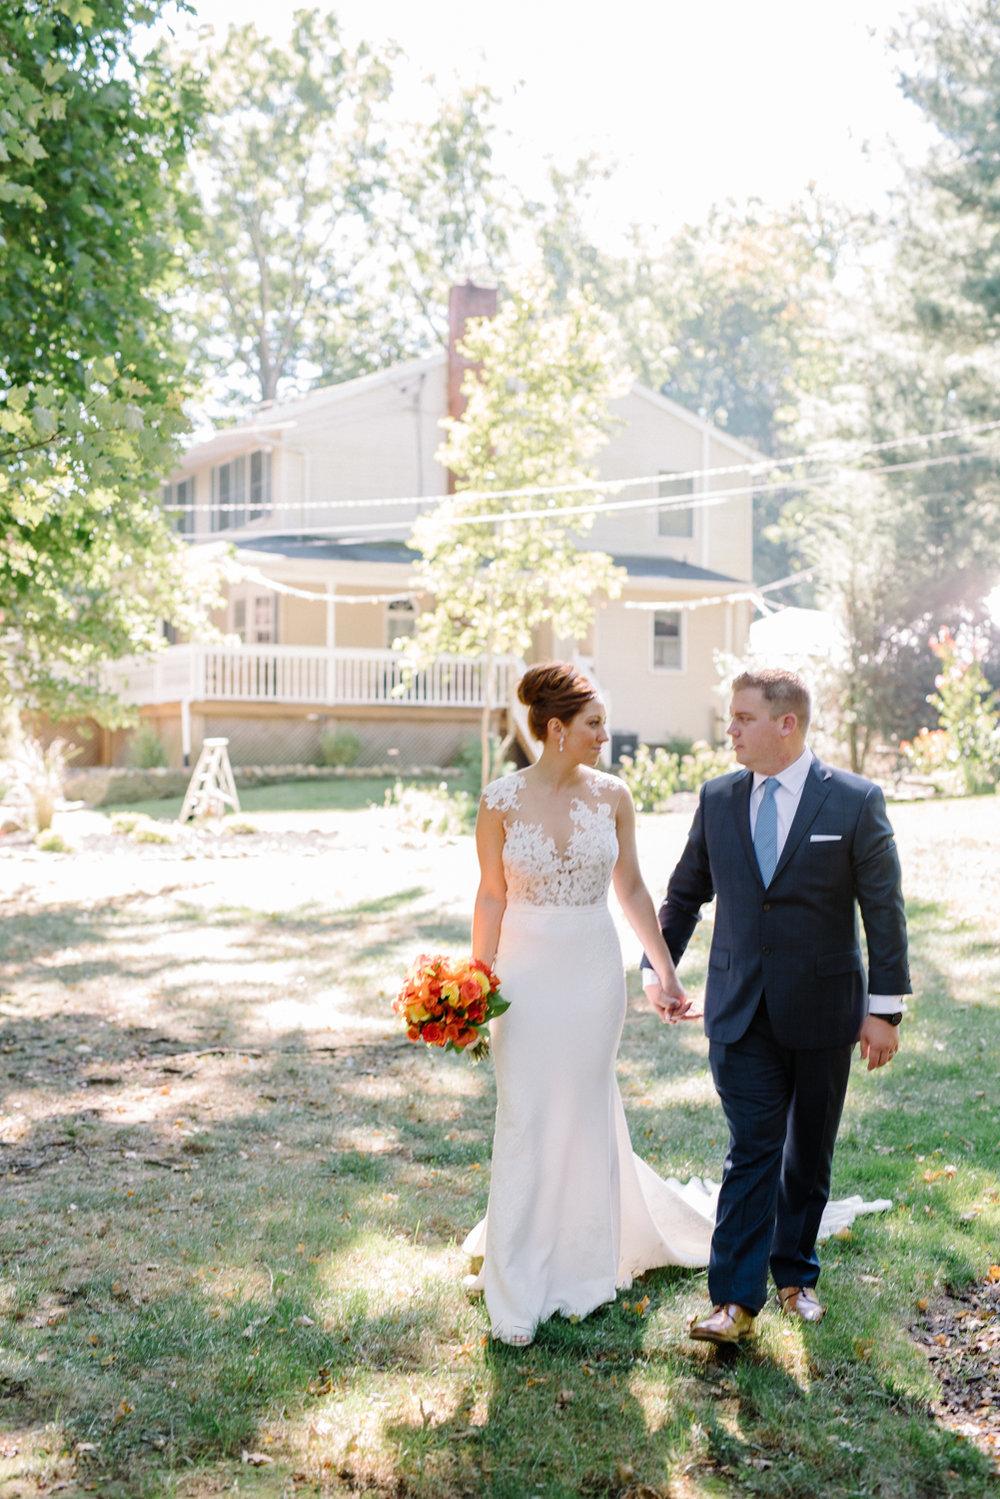 Lauren+AJ- DIY Backyard Wedding- New Jersey- Olivia Christina Photo-82.JPG